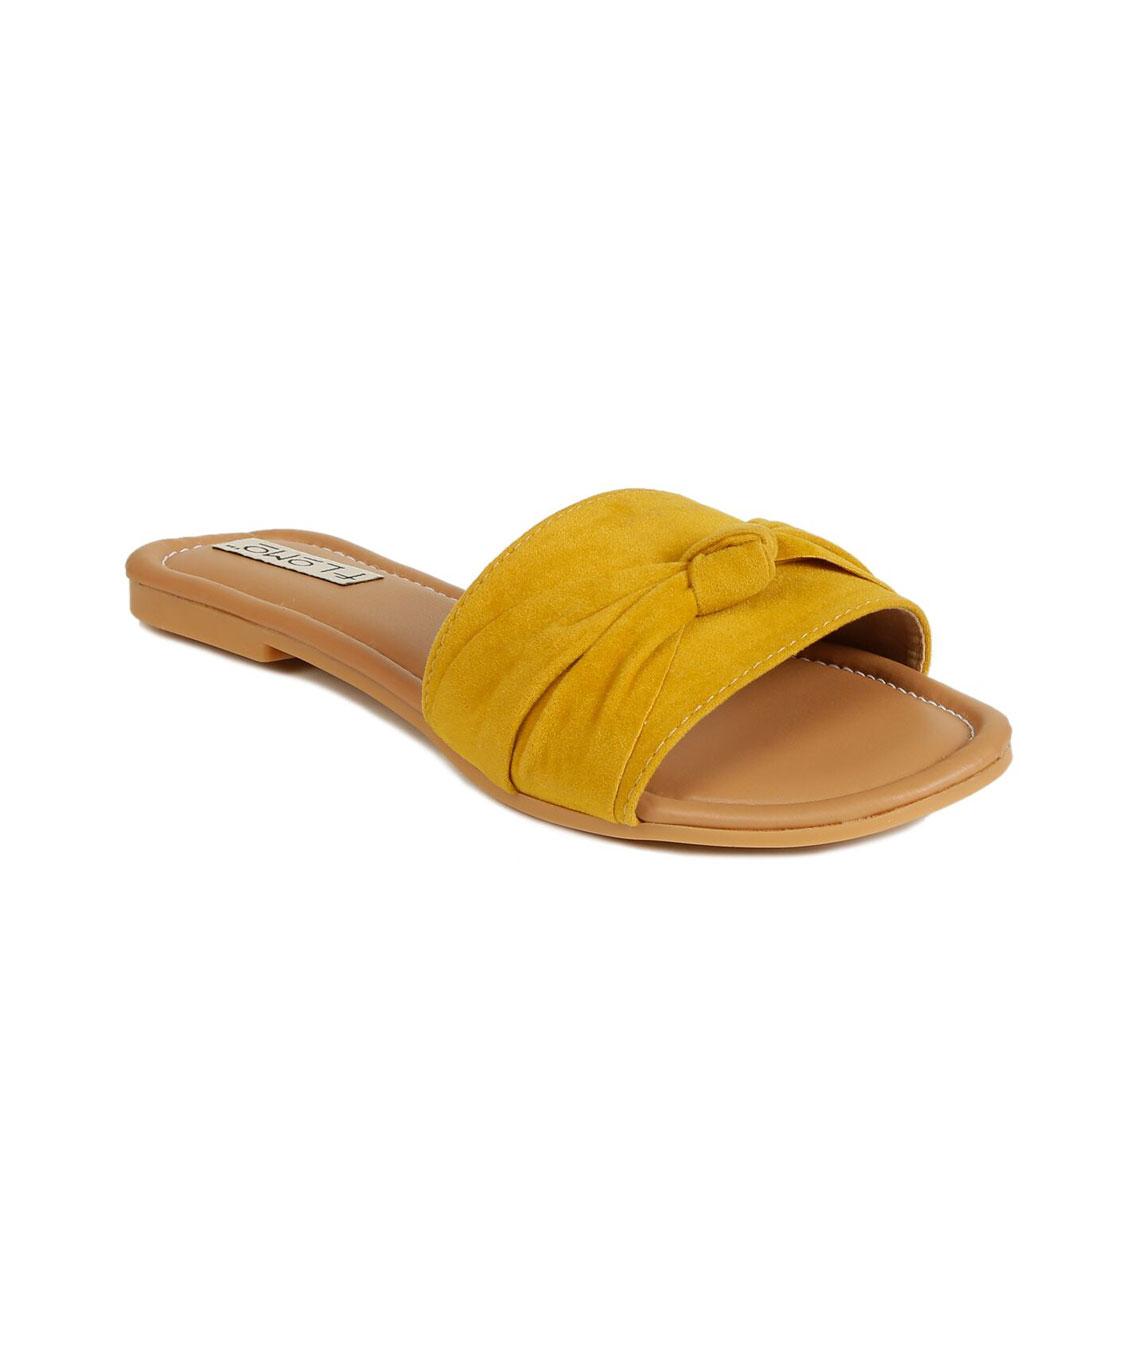 Flomo Women`s Yellow Resin Casual Flip Flop